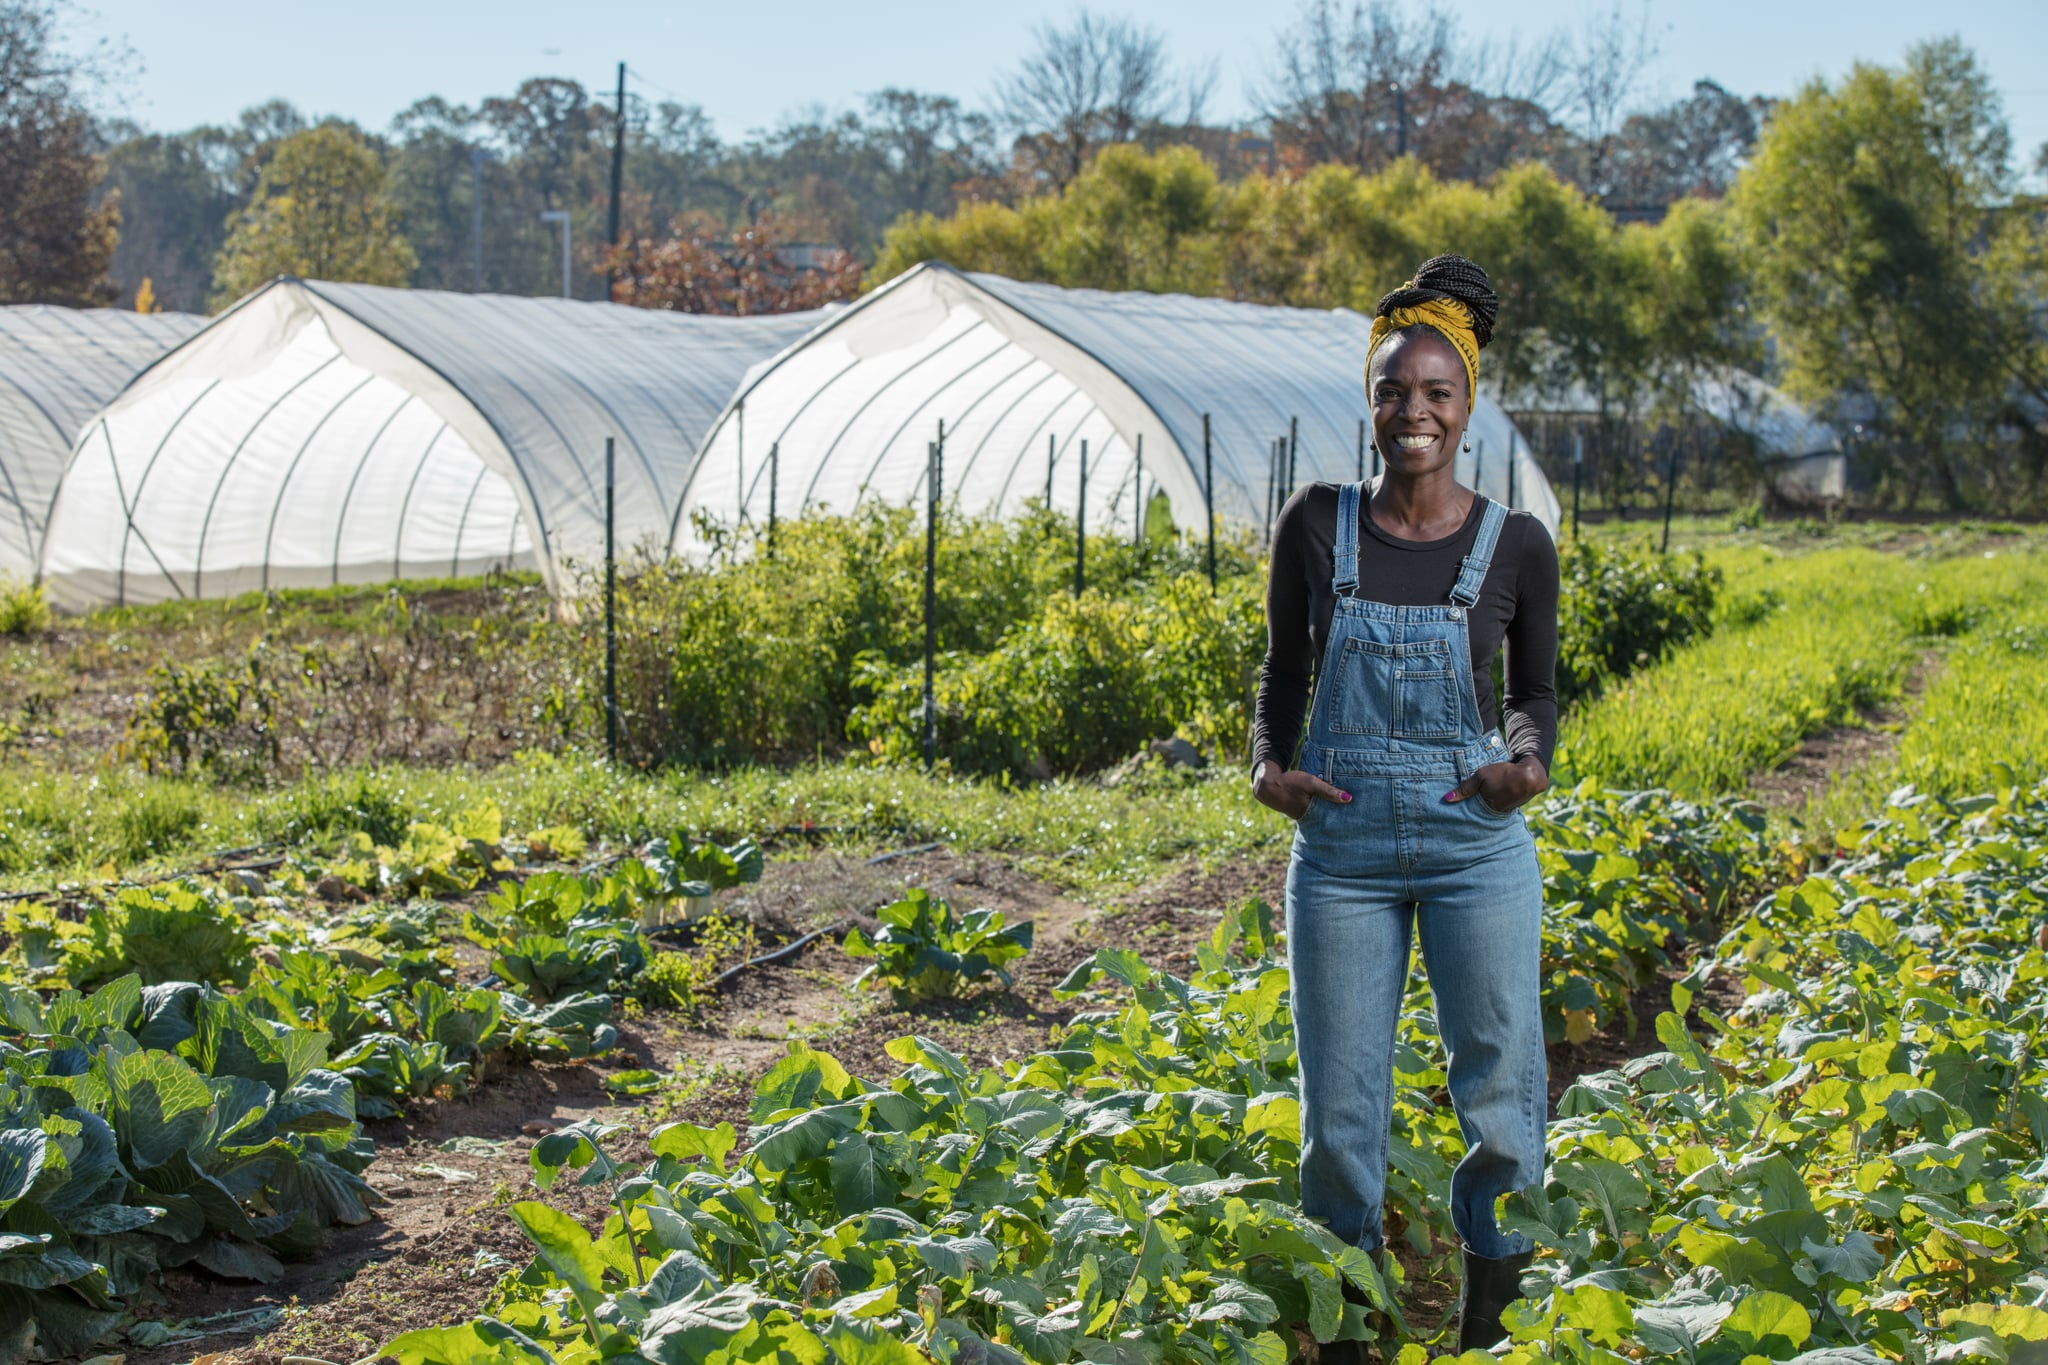 Host Jamila Norman poses with crops at a farm in Atlanta, as seen on Homegrown, Season 1.